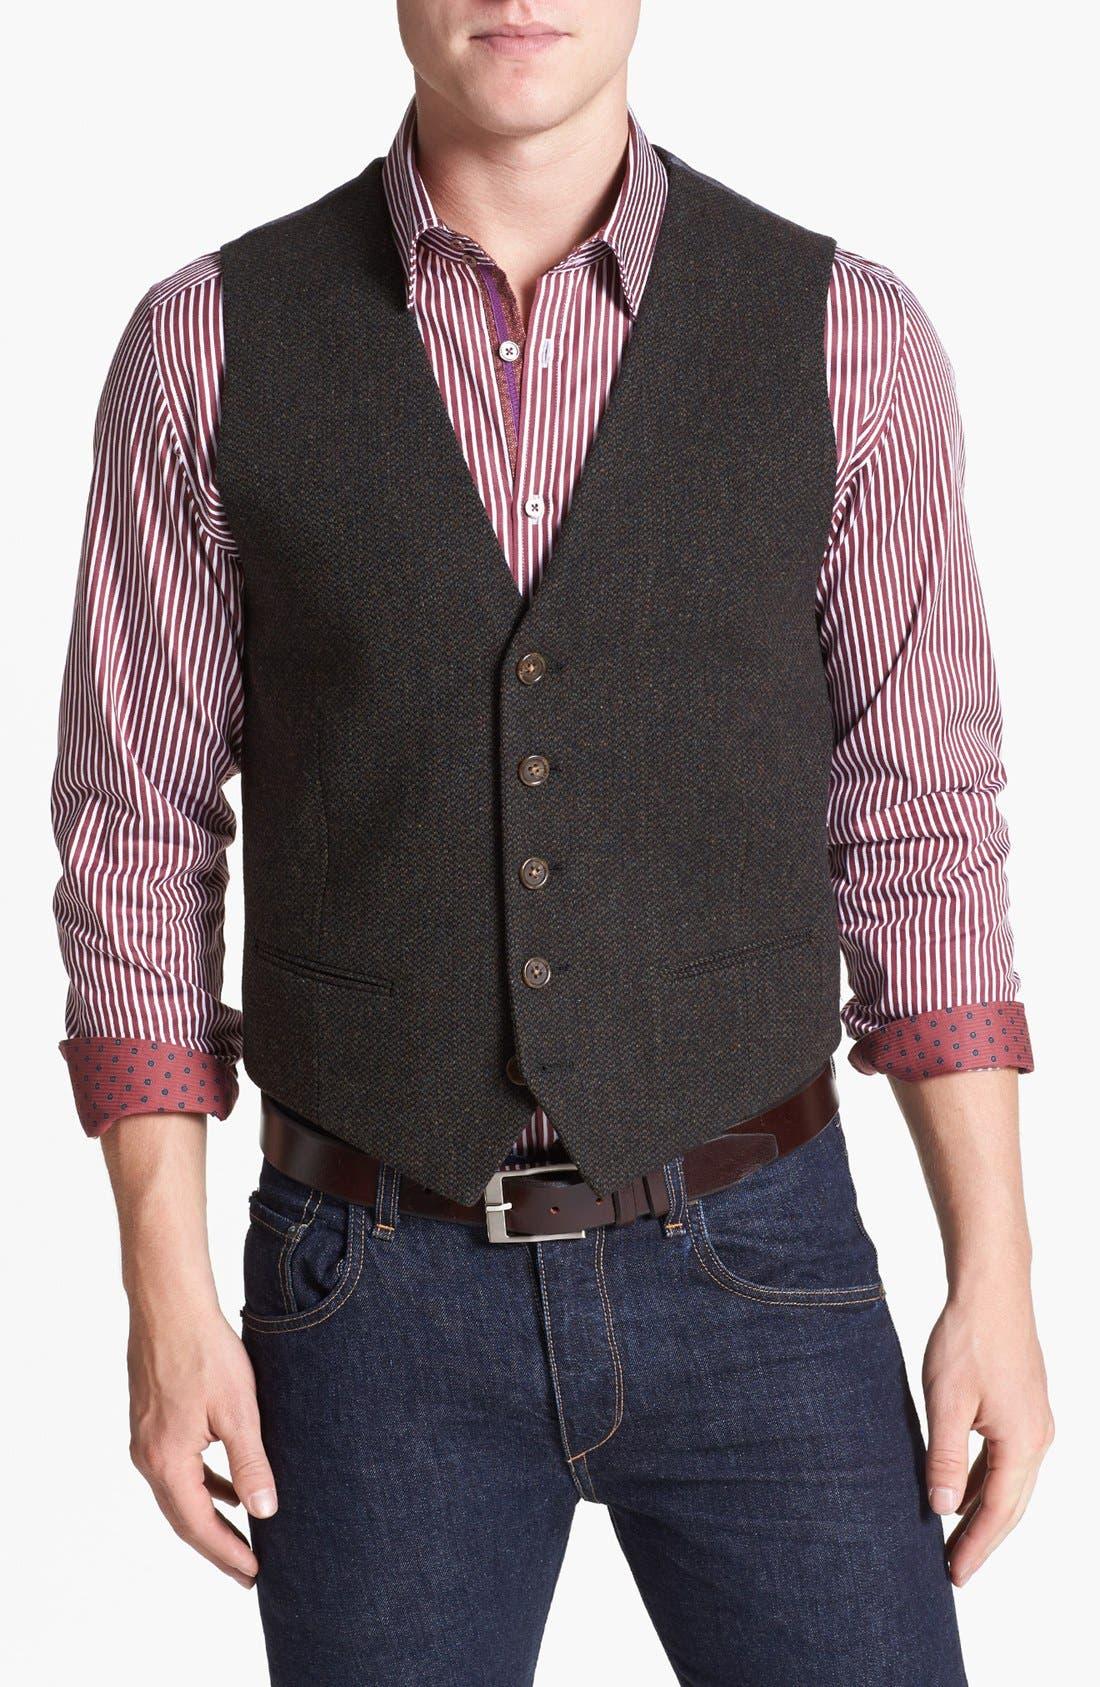 Main Image - Wallin & Bros. Trim Fit Donegal Vest